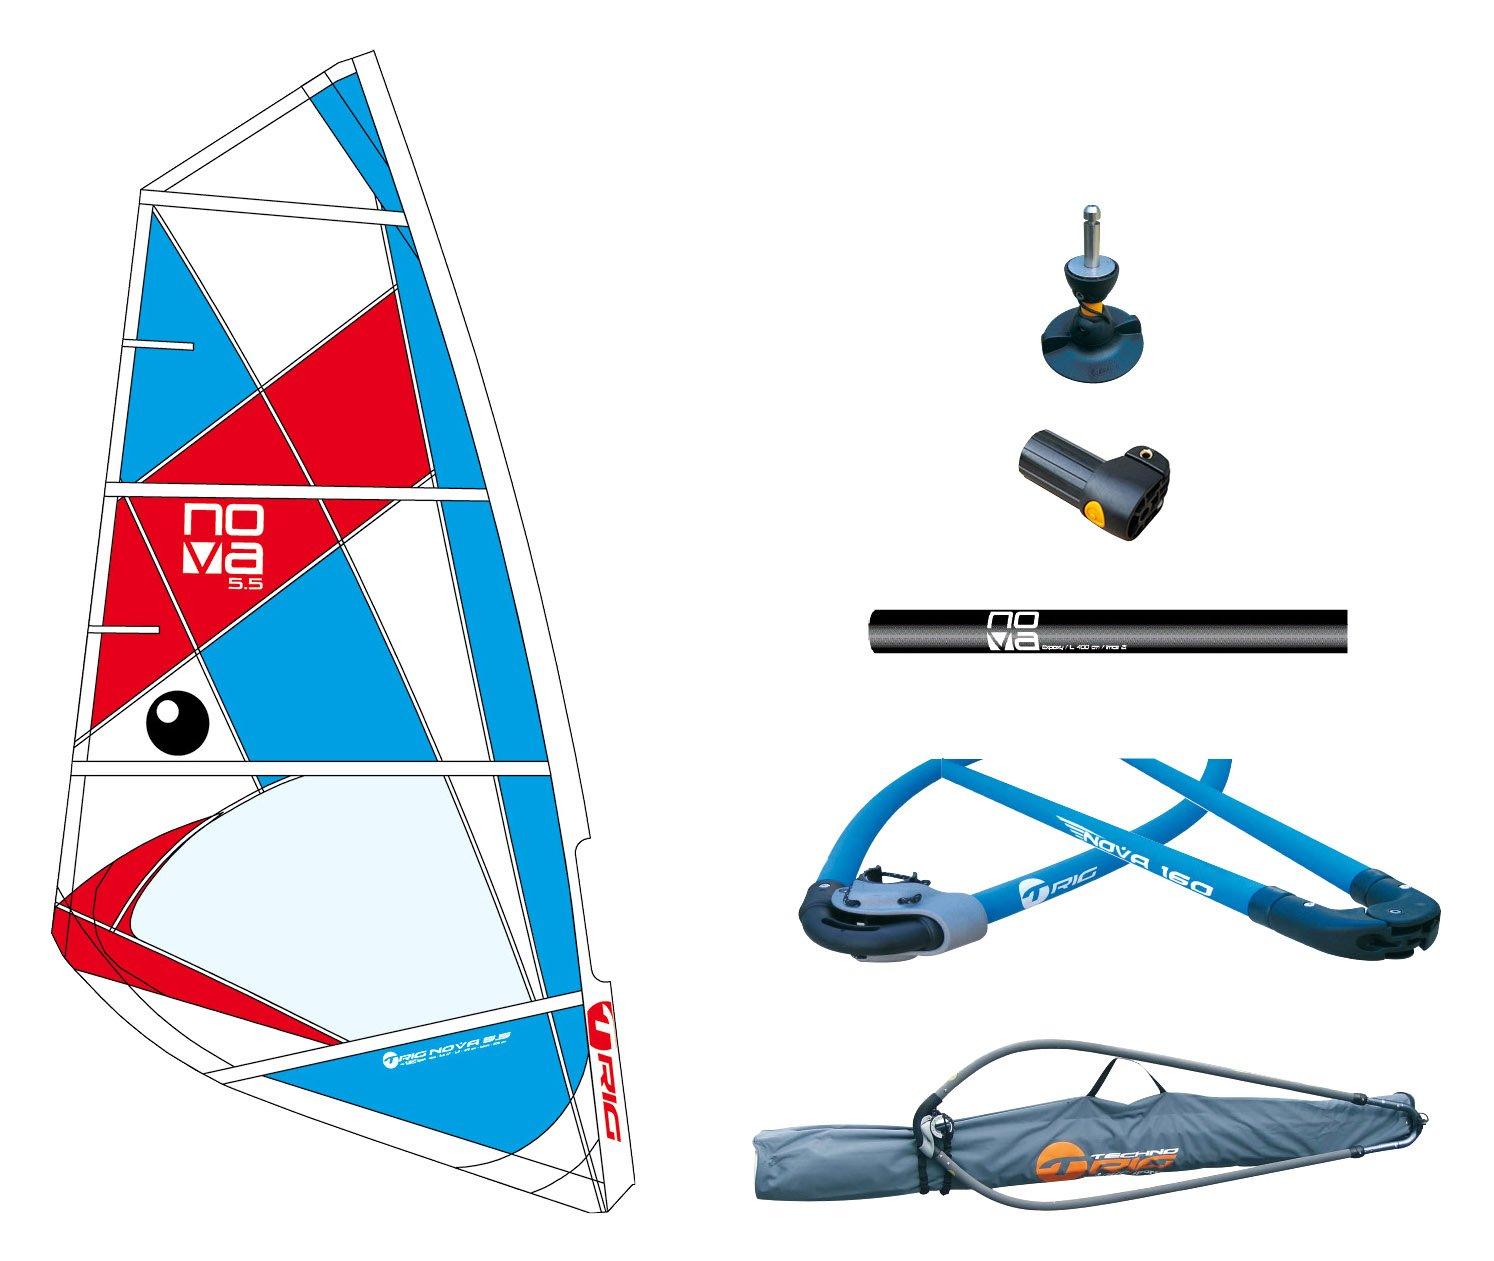 BIC SPORT(ビックスポーツ) Nova 4,5 m2 [100352] ボード ウィンドサーフ リグセット   B00MJATLU4